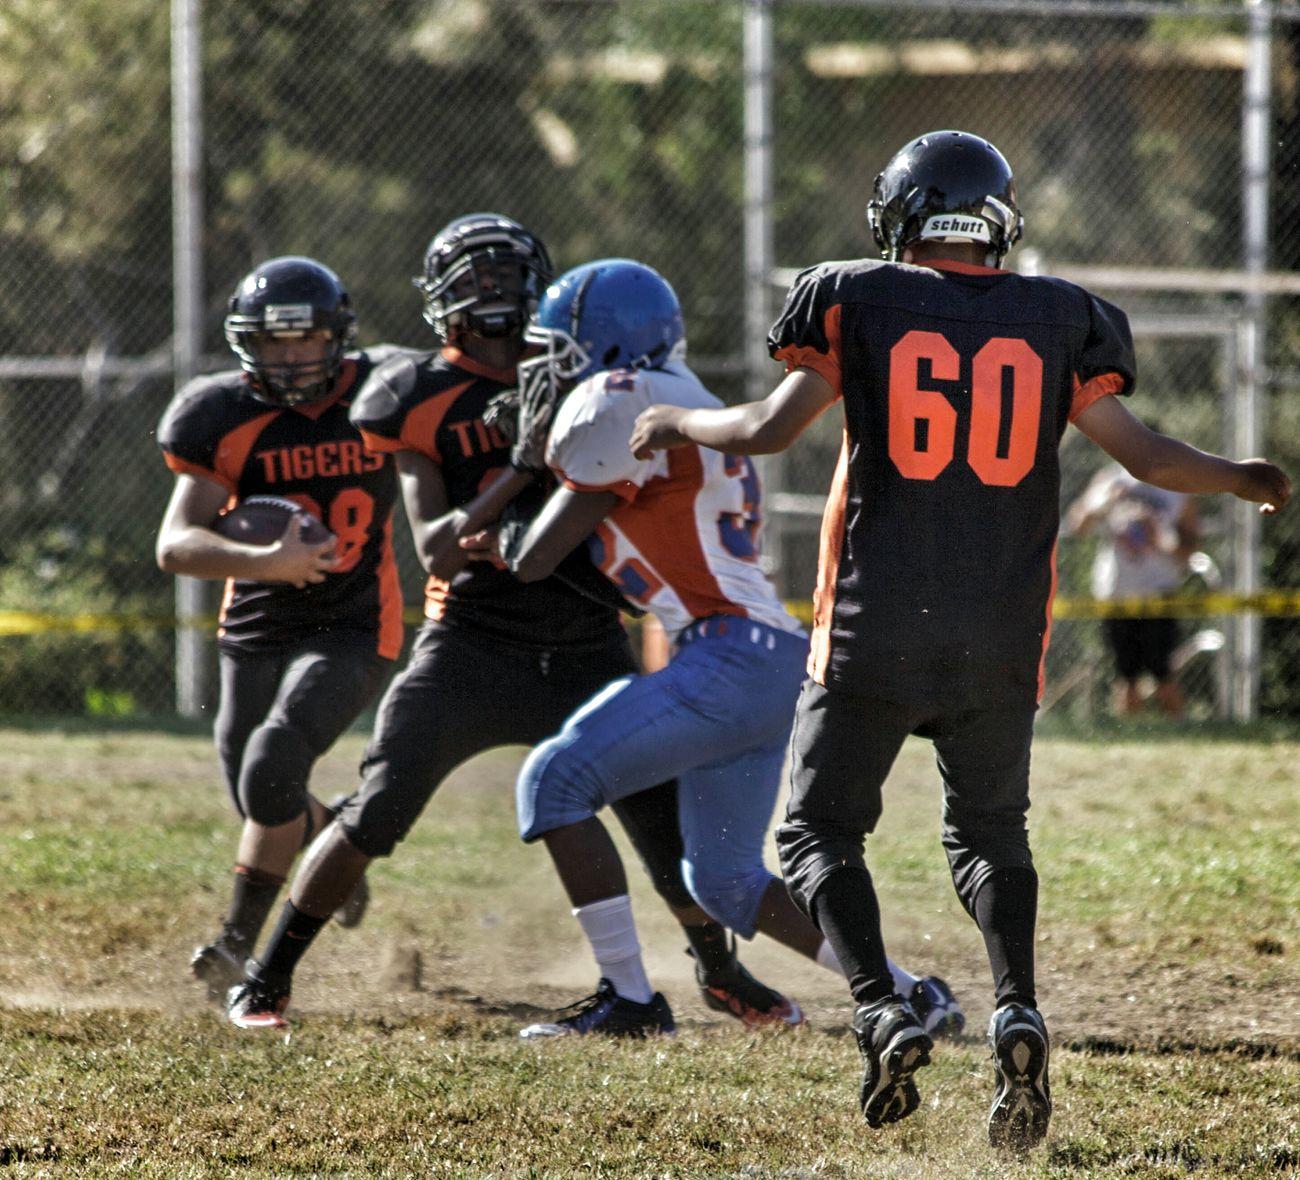 Football Highschool Los Angeles, California Canon 5D Mark II